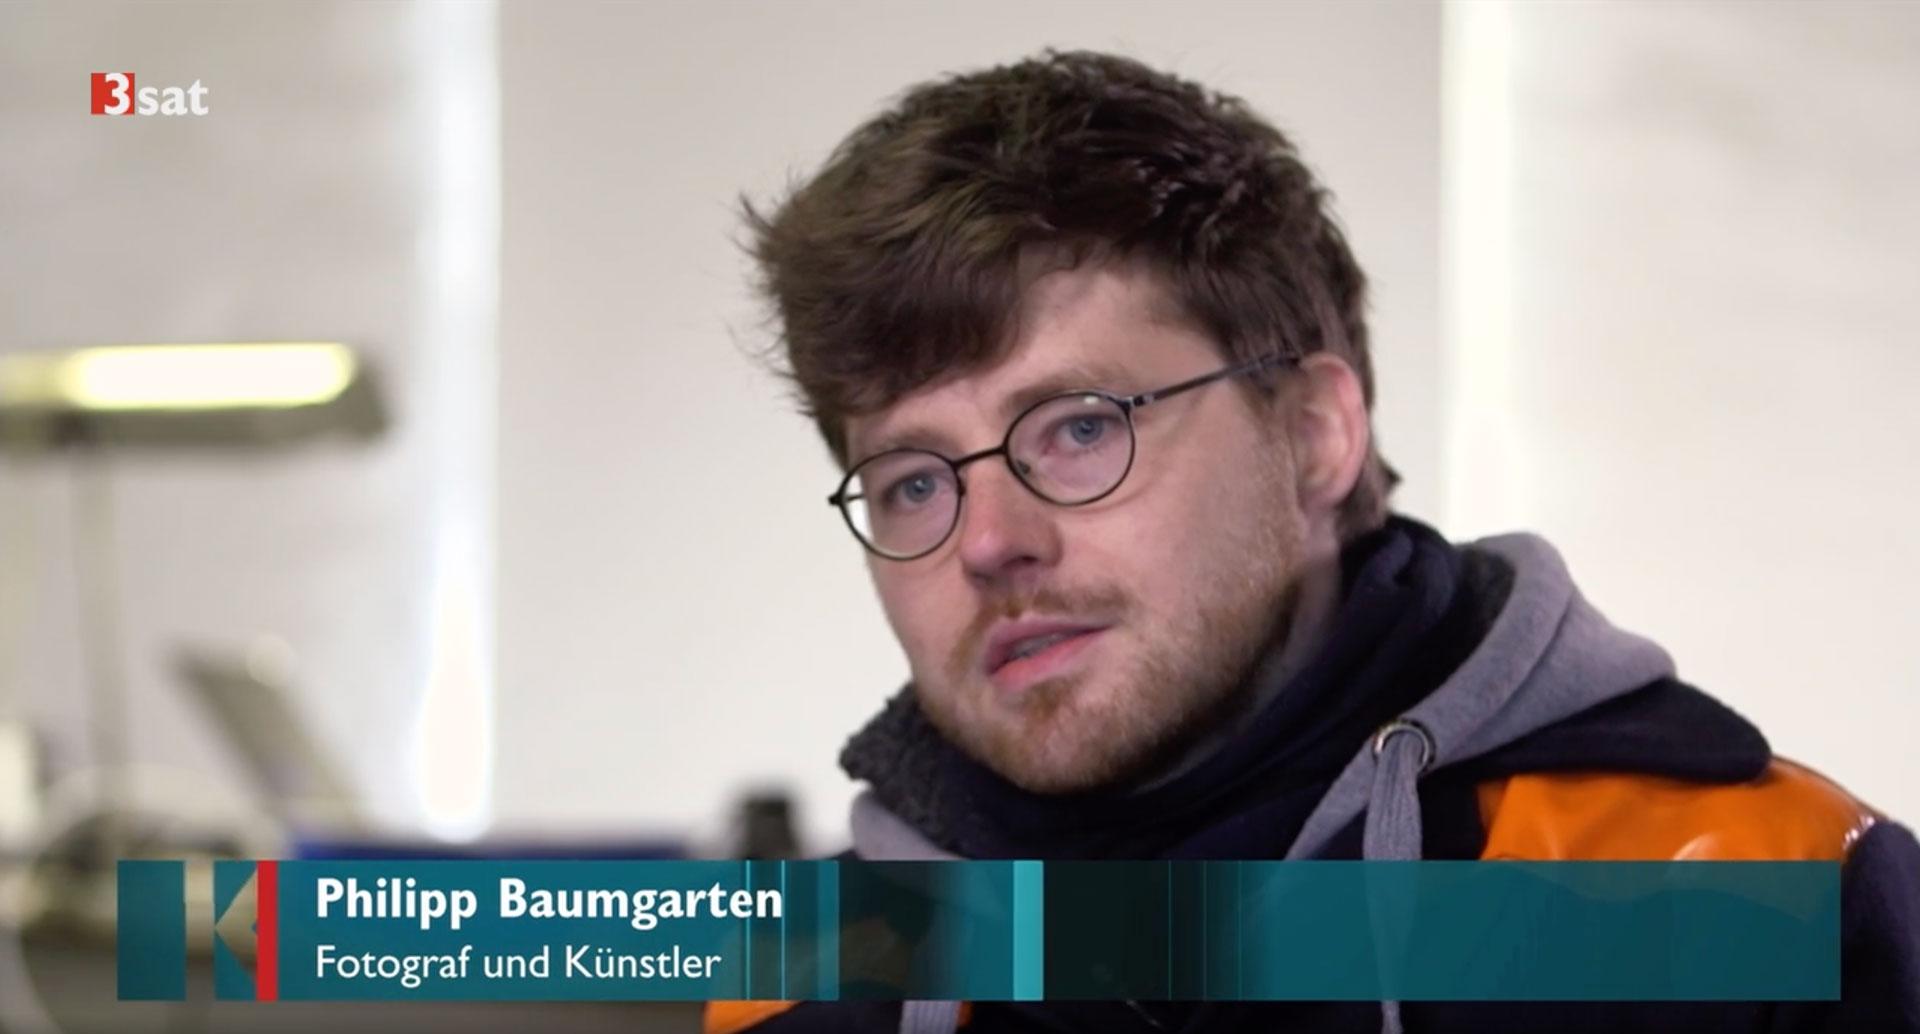 3sat interviewt Philipp Baumgarten